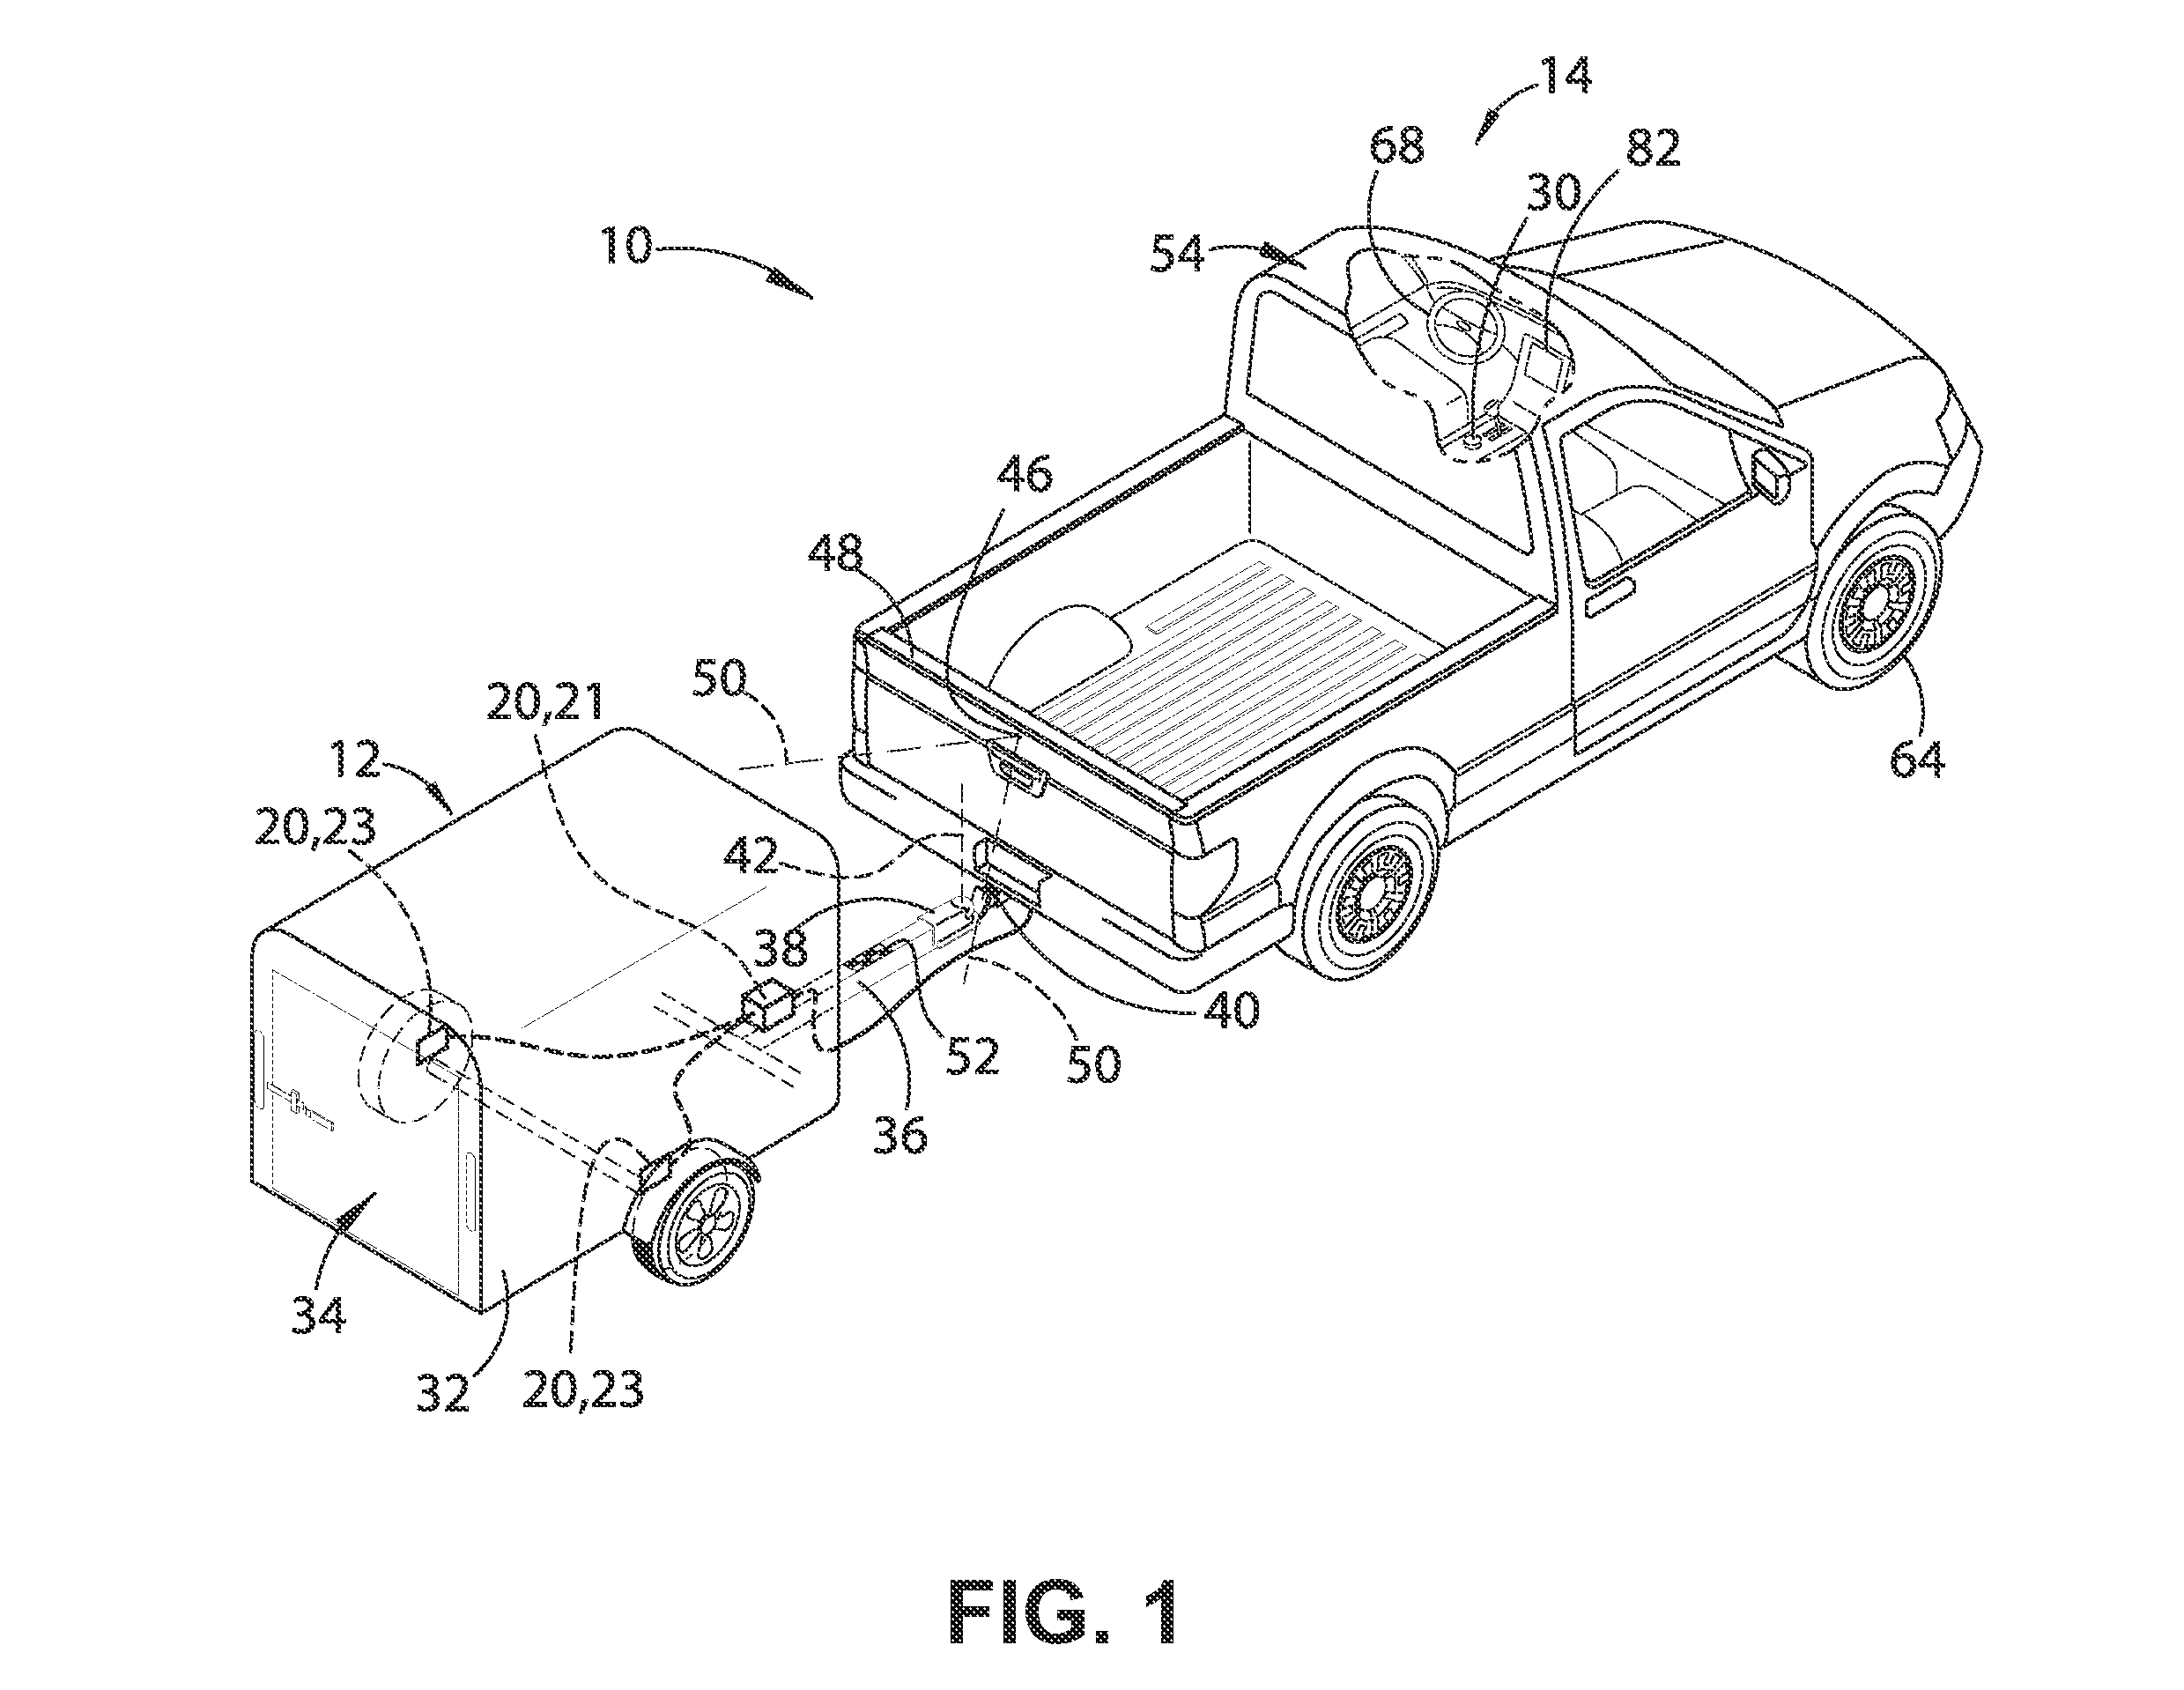 Patent US 9,926,008 B2